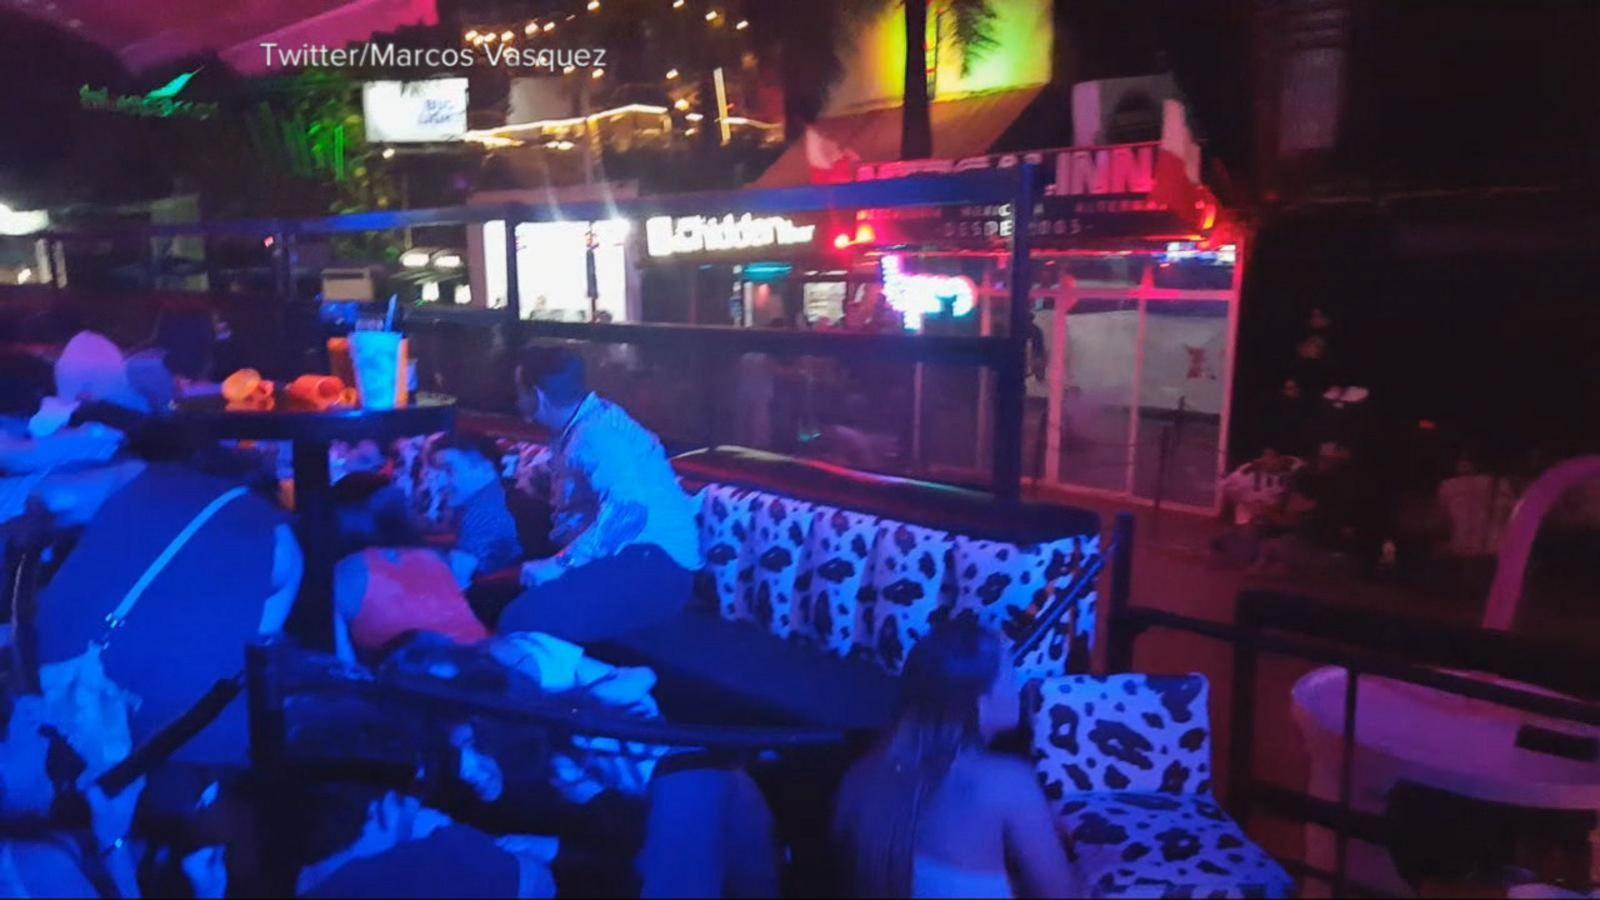 VIDEO: 5 Dead in Seaside Nightclub Shooting in Mexico